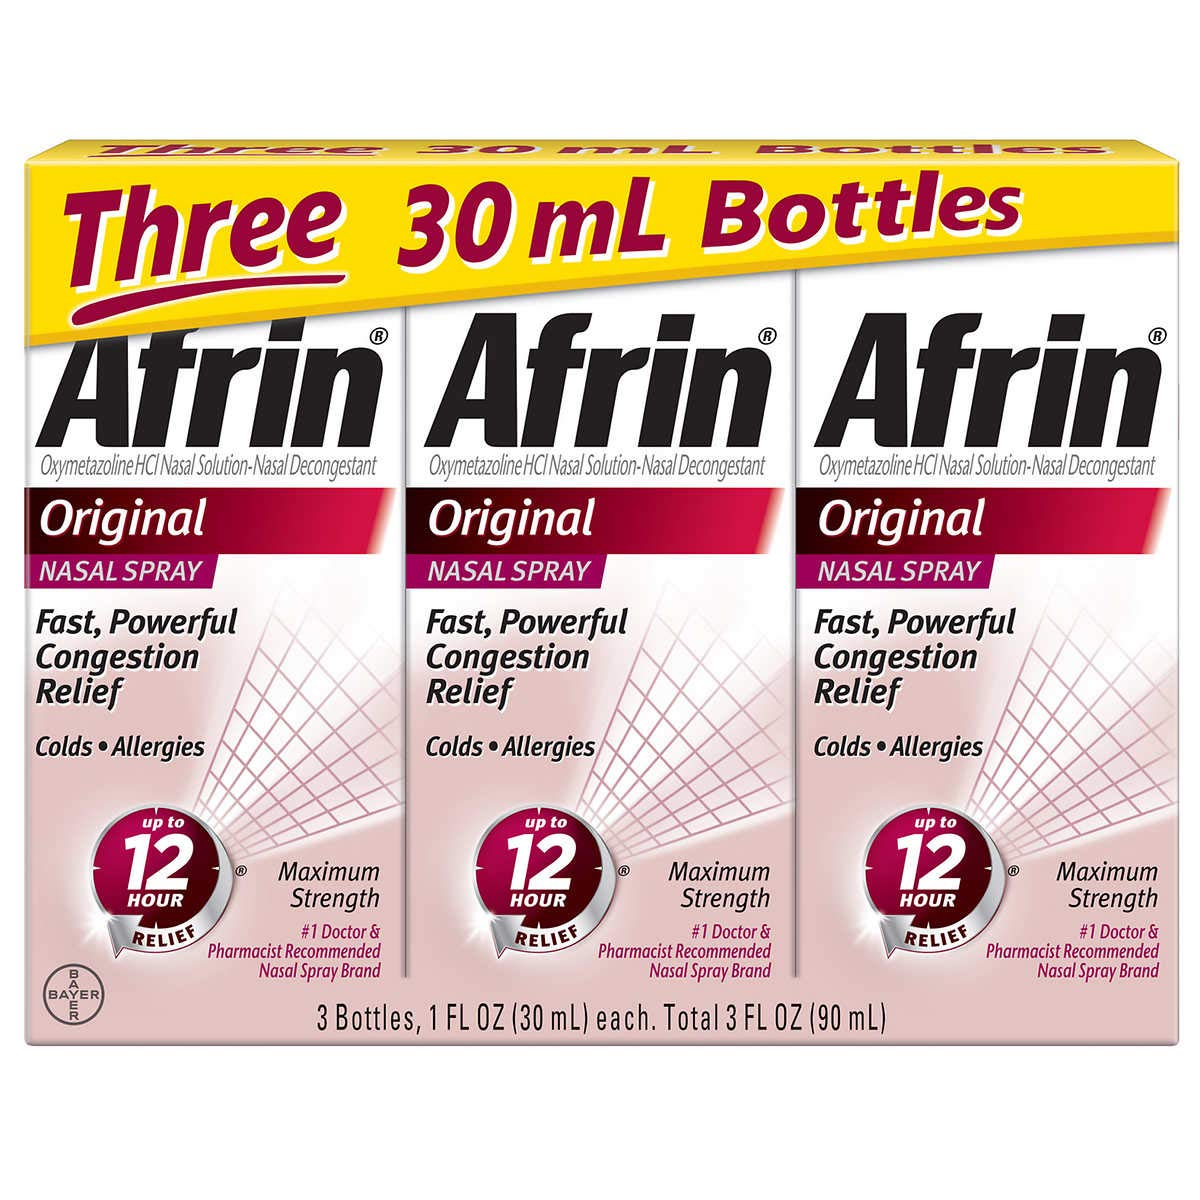 Afrin Original Maximum Strength 12 Hour Nasal Congestion Relief Spray - 30 mL